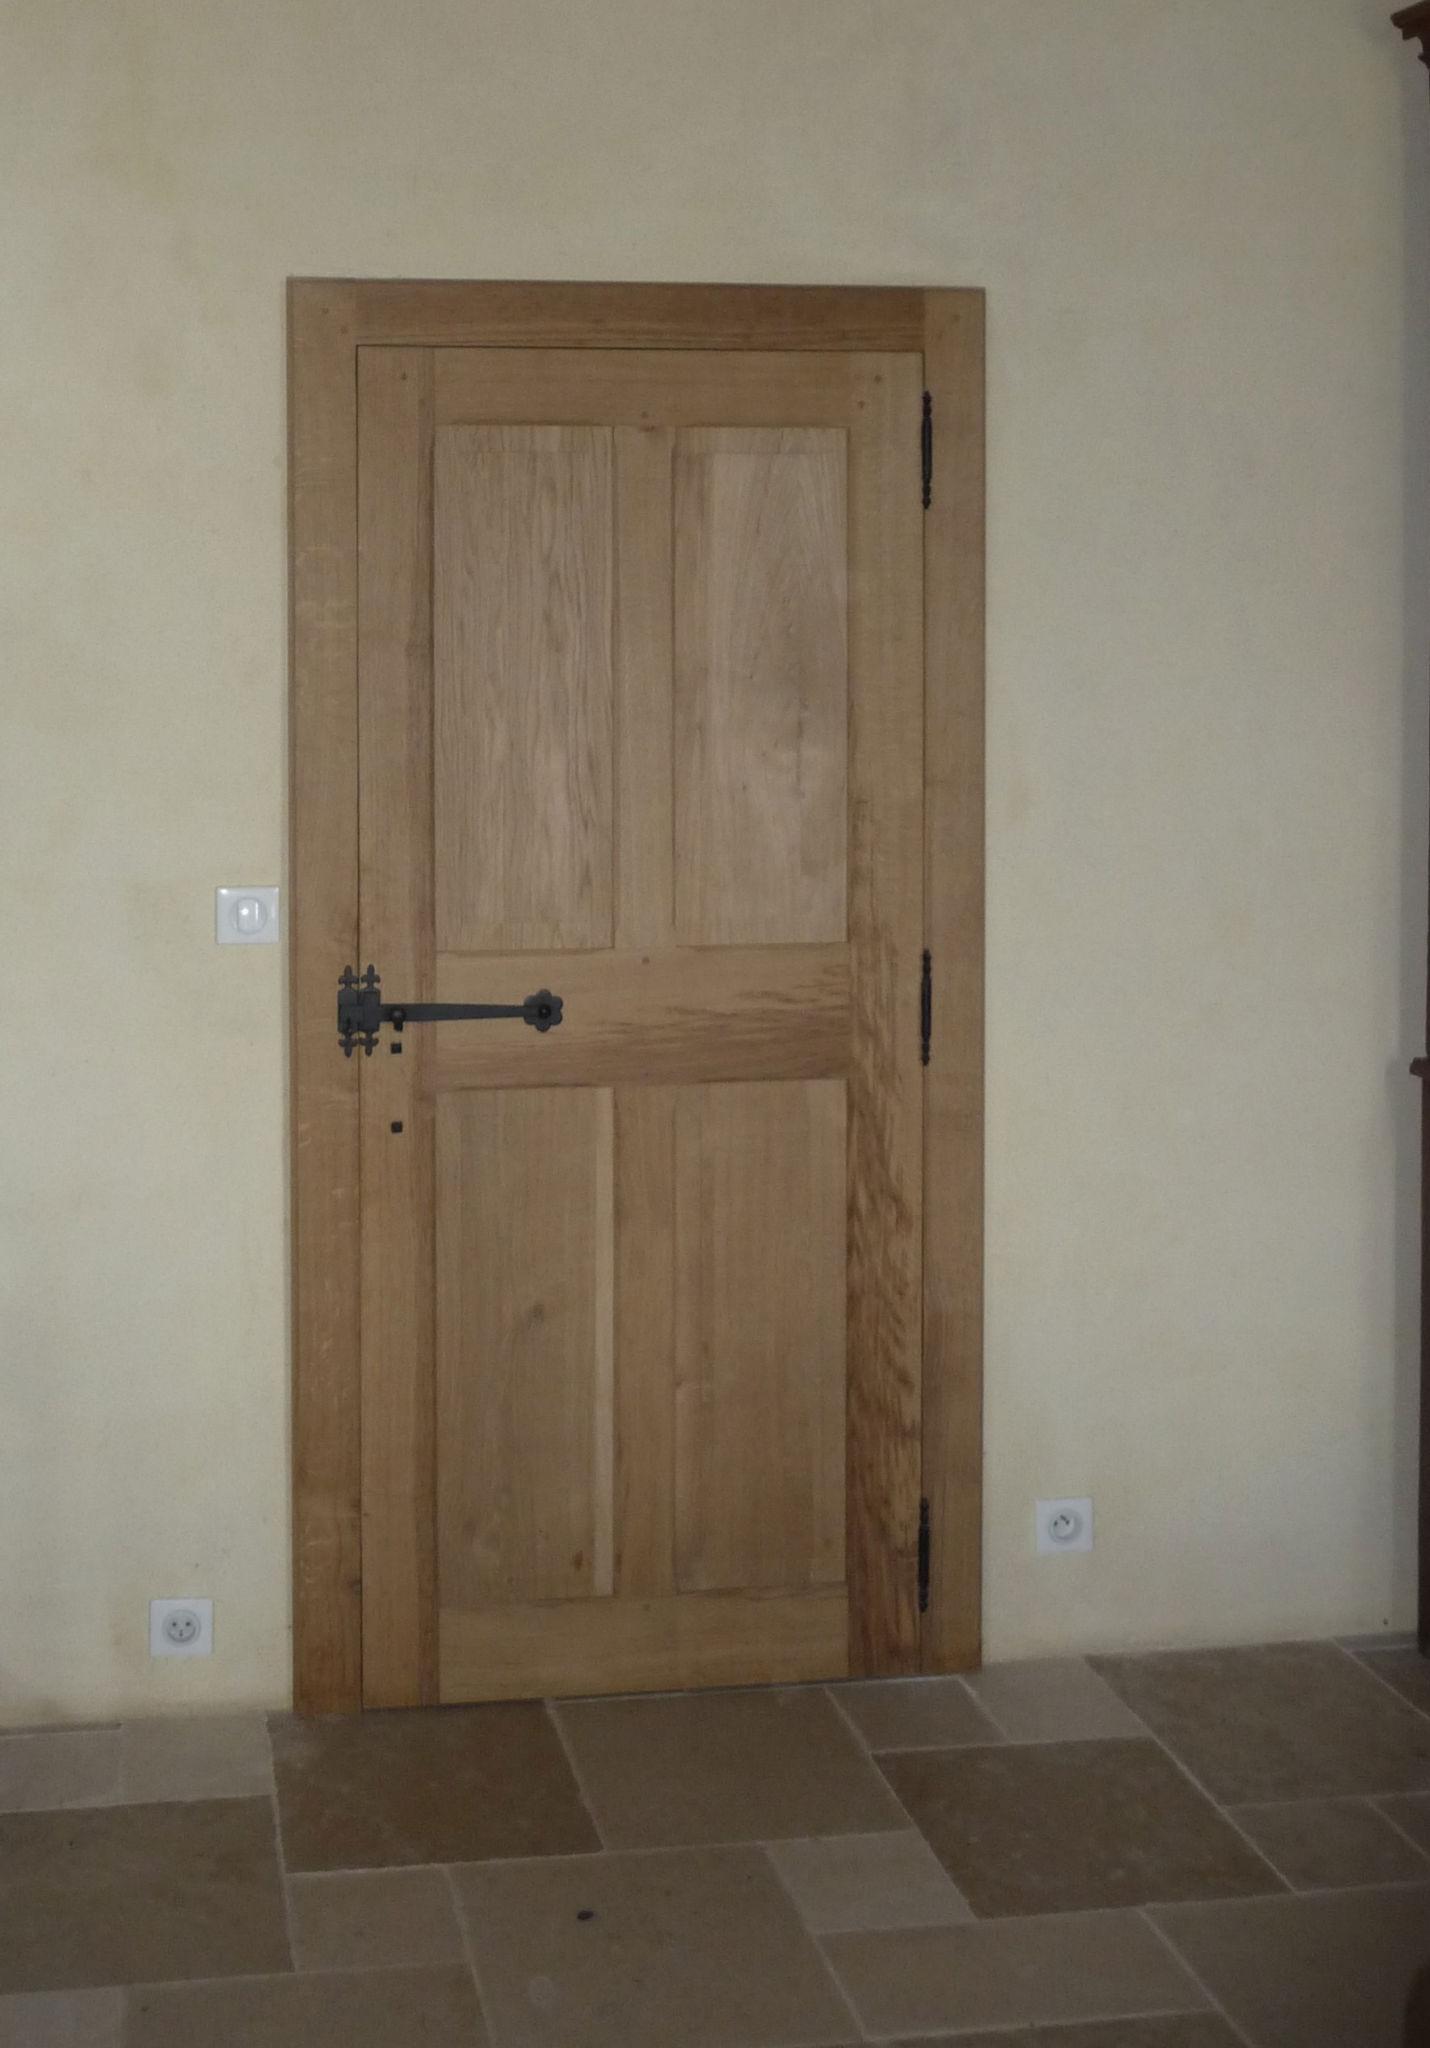 Porte d int rieur menuiserie eb nisterie teddy gandolfi for Menuiserie porte interieur